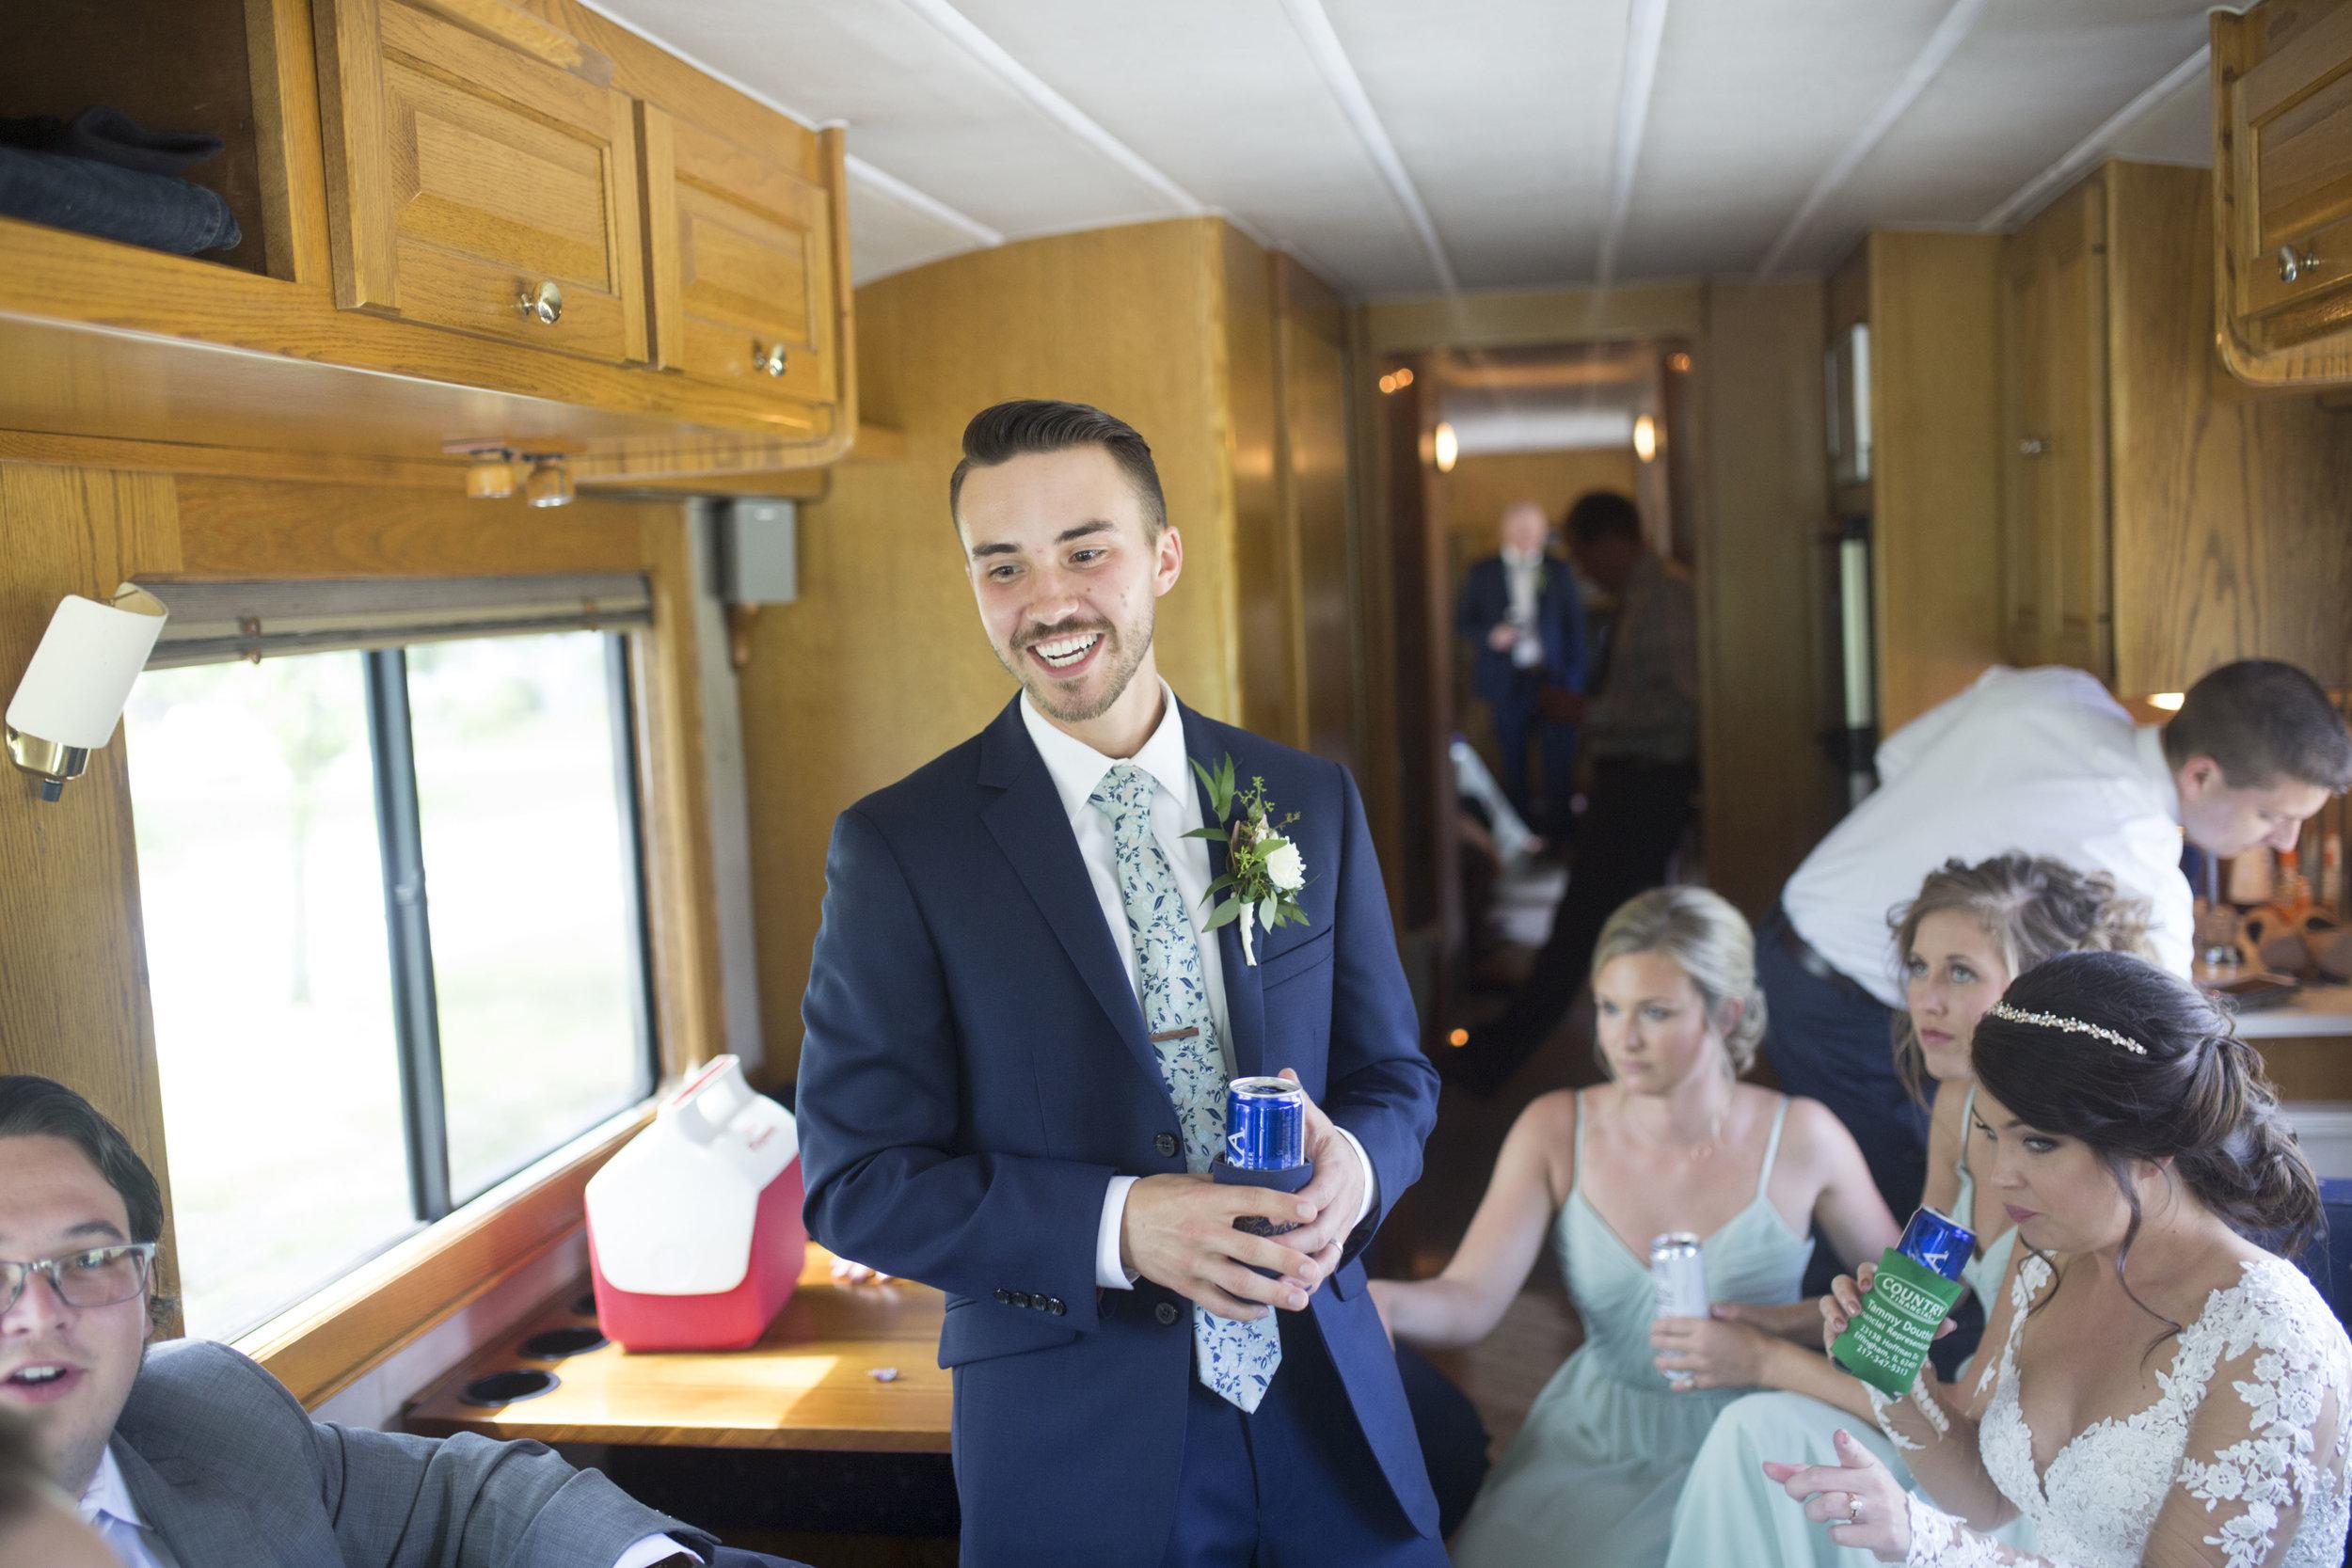 Nosbisch Wedding 5D 867.jpg